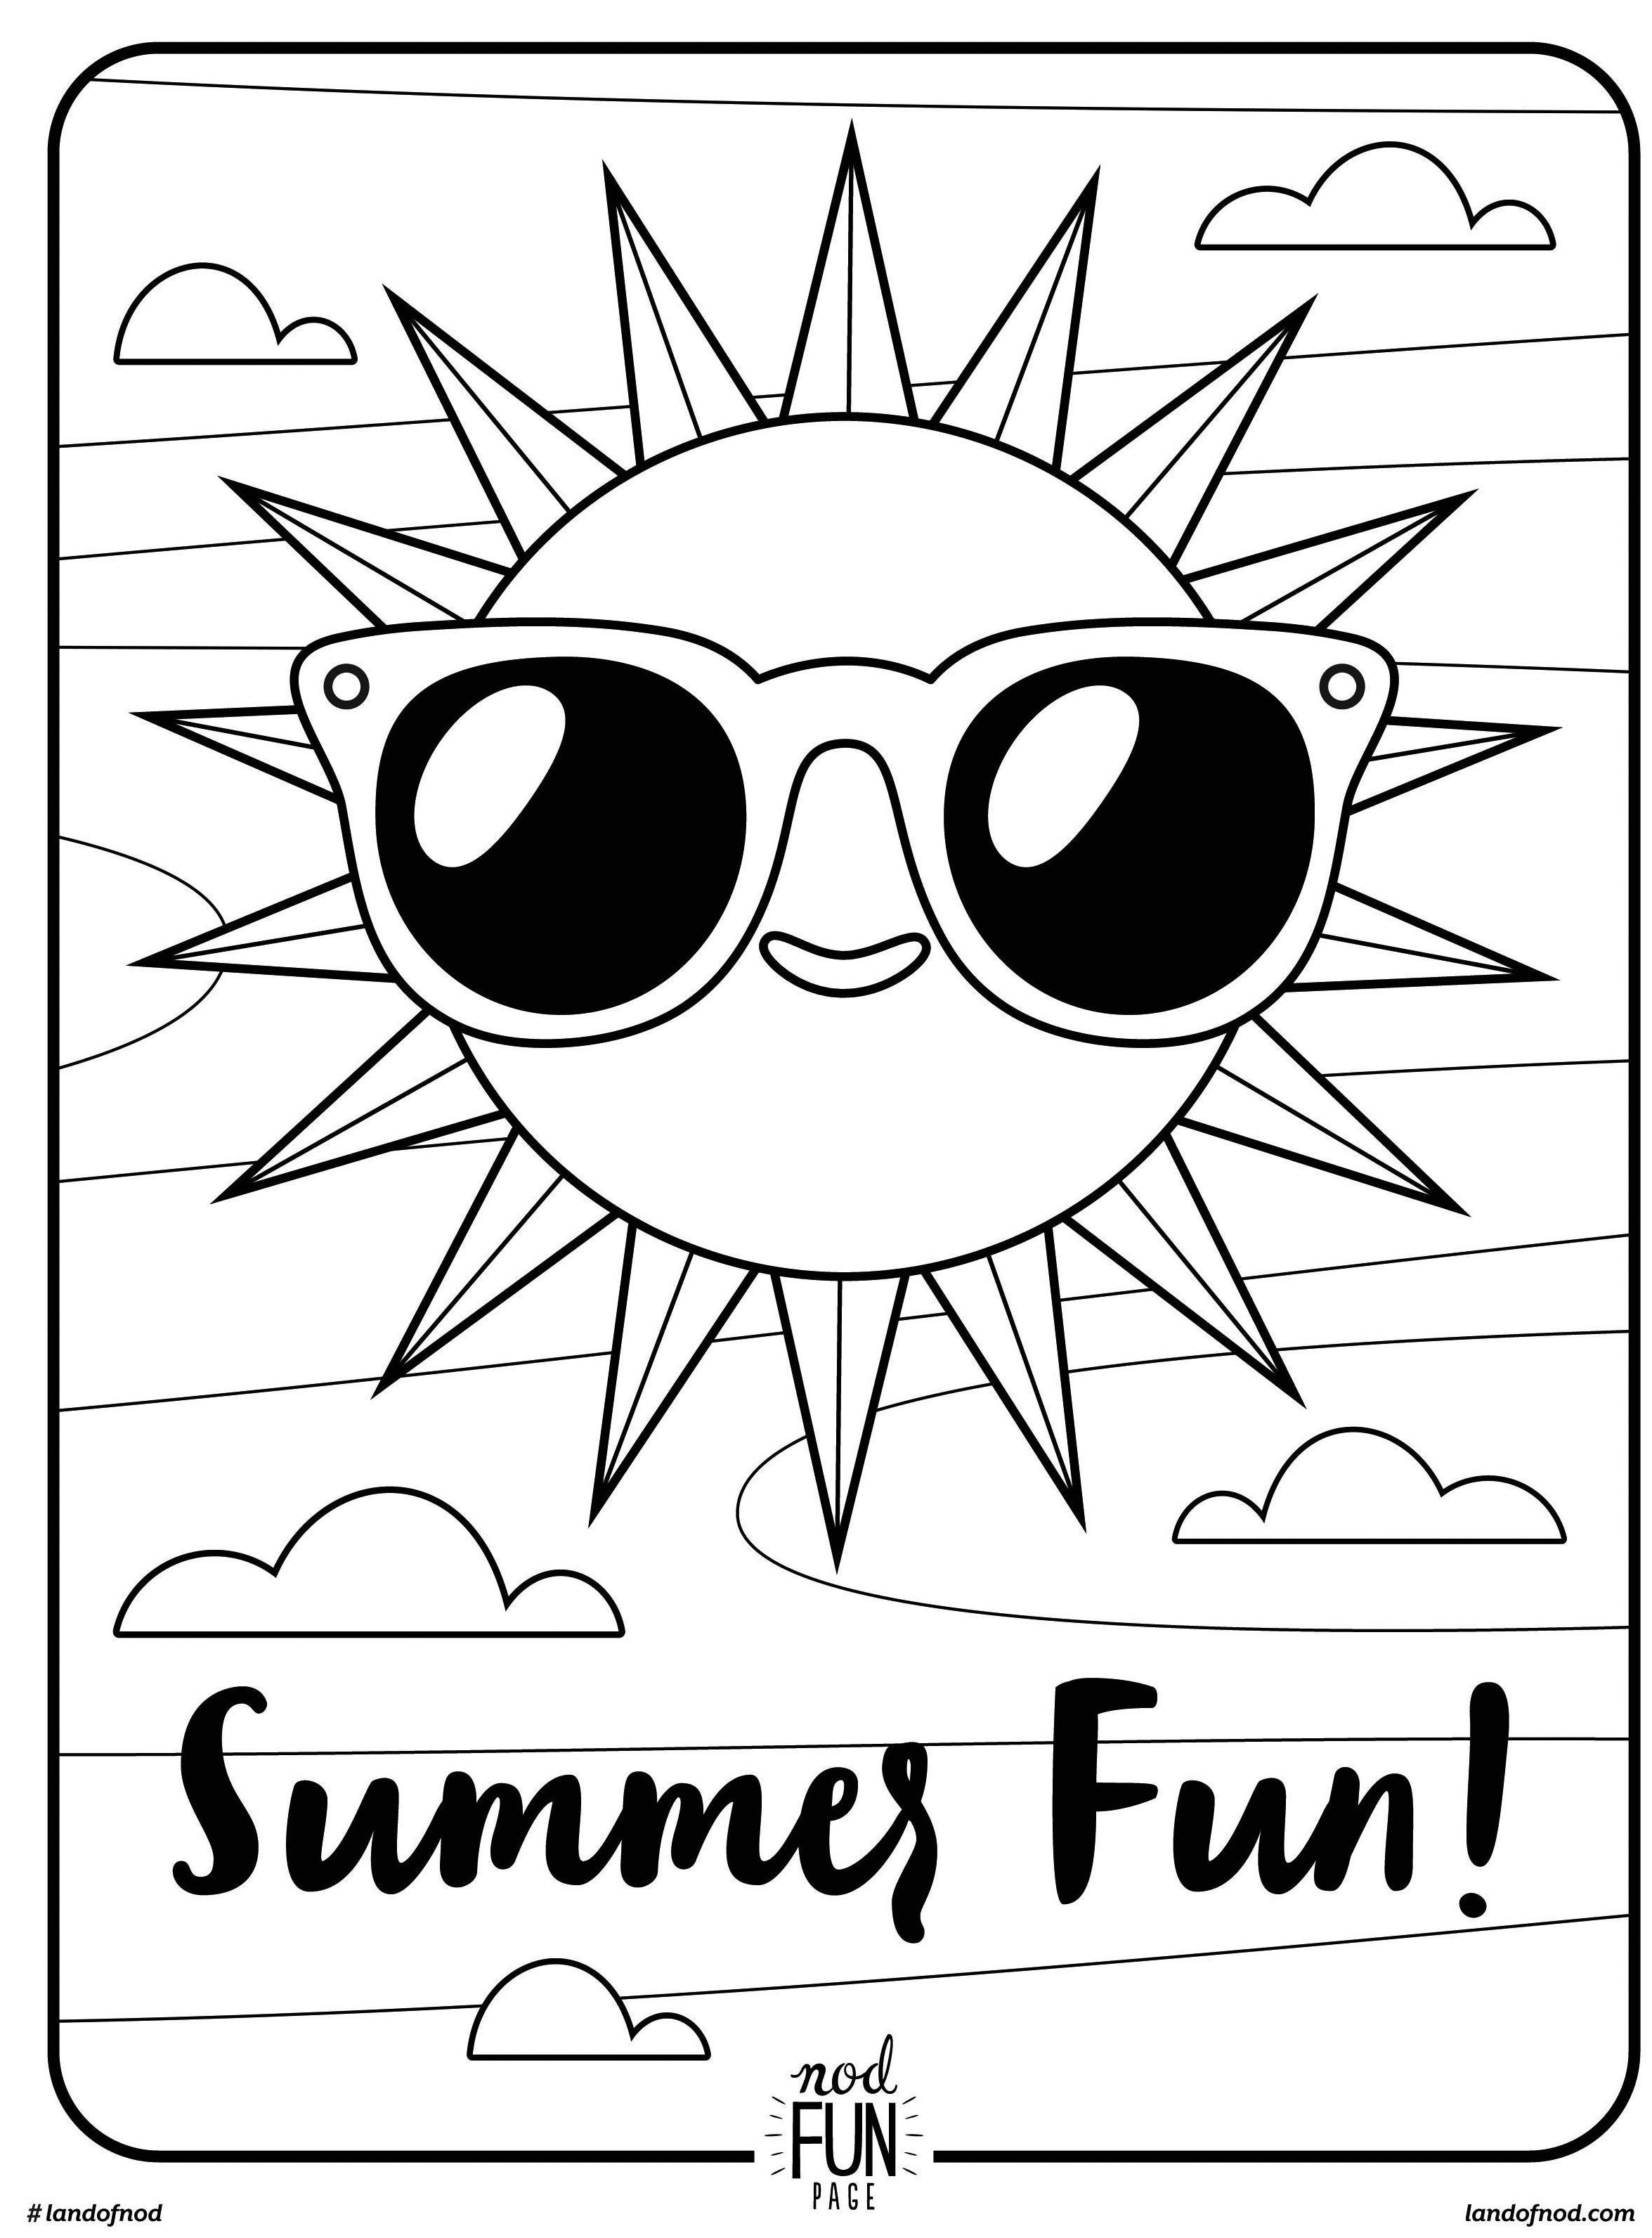 Free Printable Coloring Page: Summer Fun | Summer | Summer Coloring - Free Printable Summer Coloring Pages